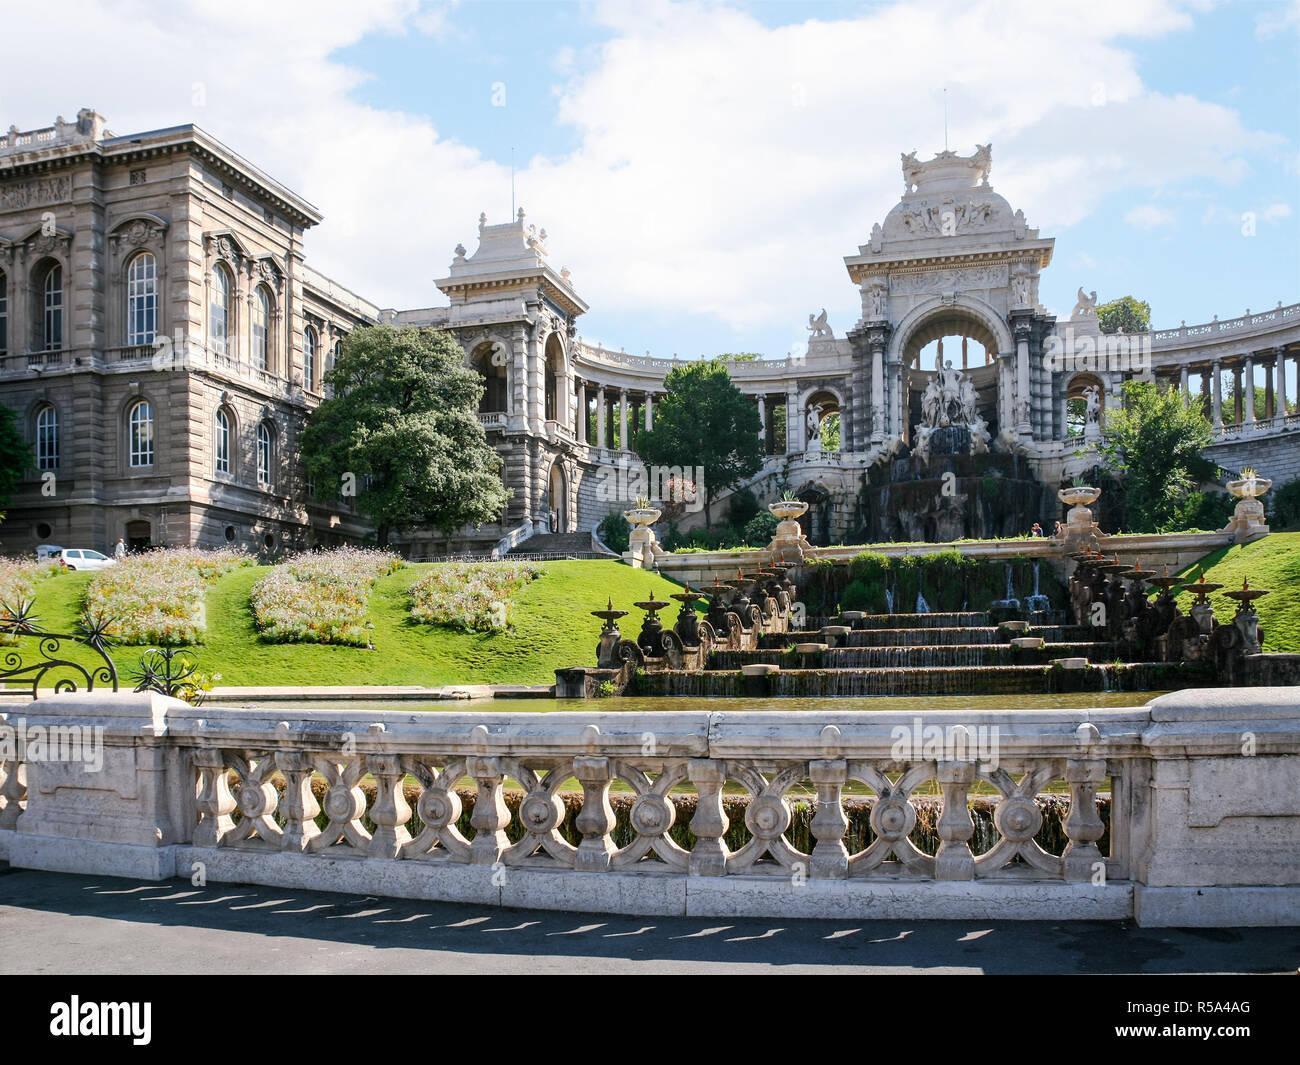 outside view of Palais (Palace) Longchamp - Stock Image